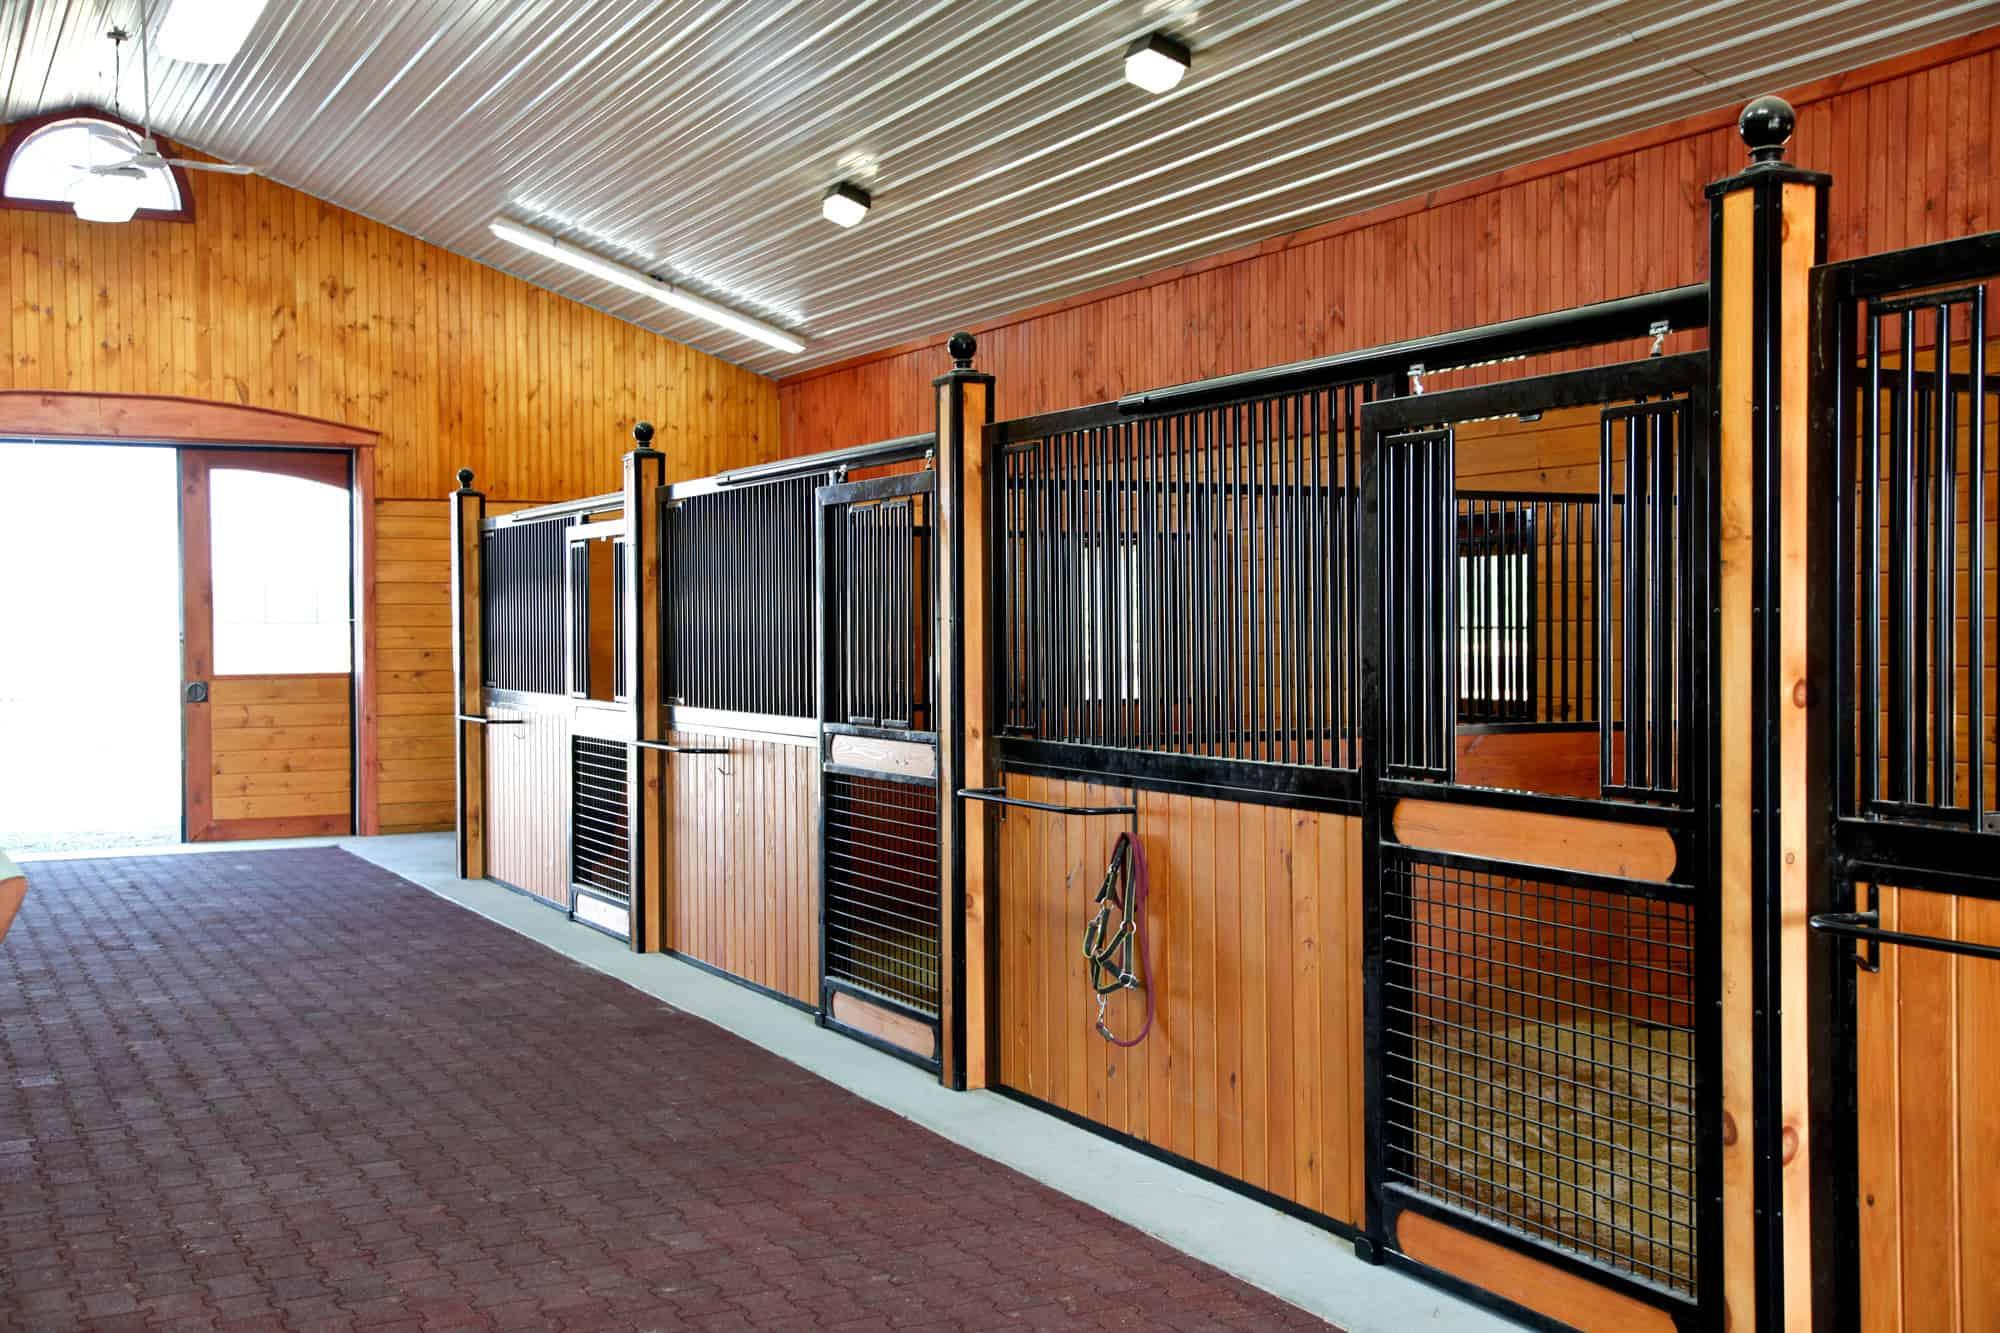 horse stalls restore after